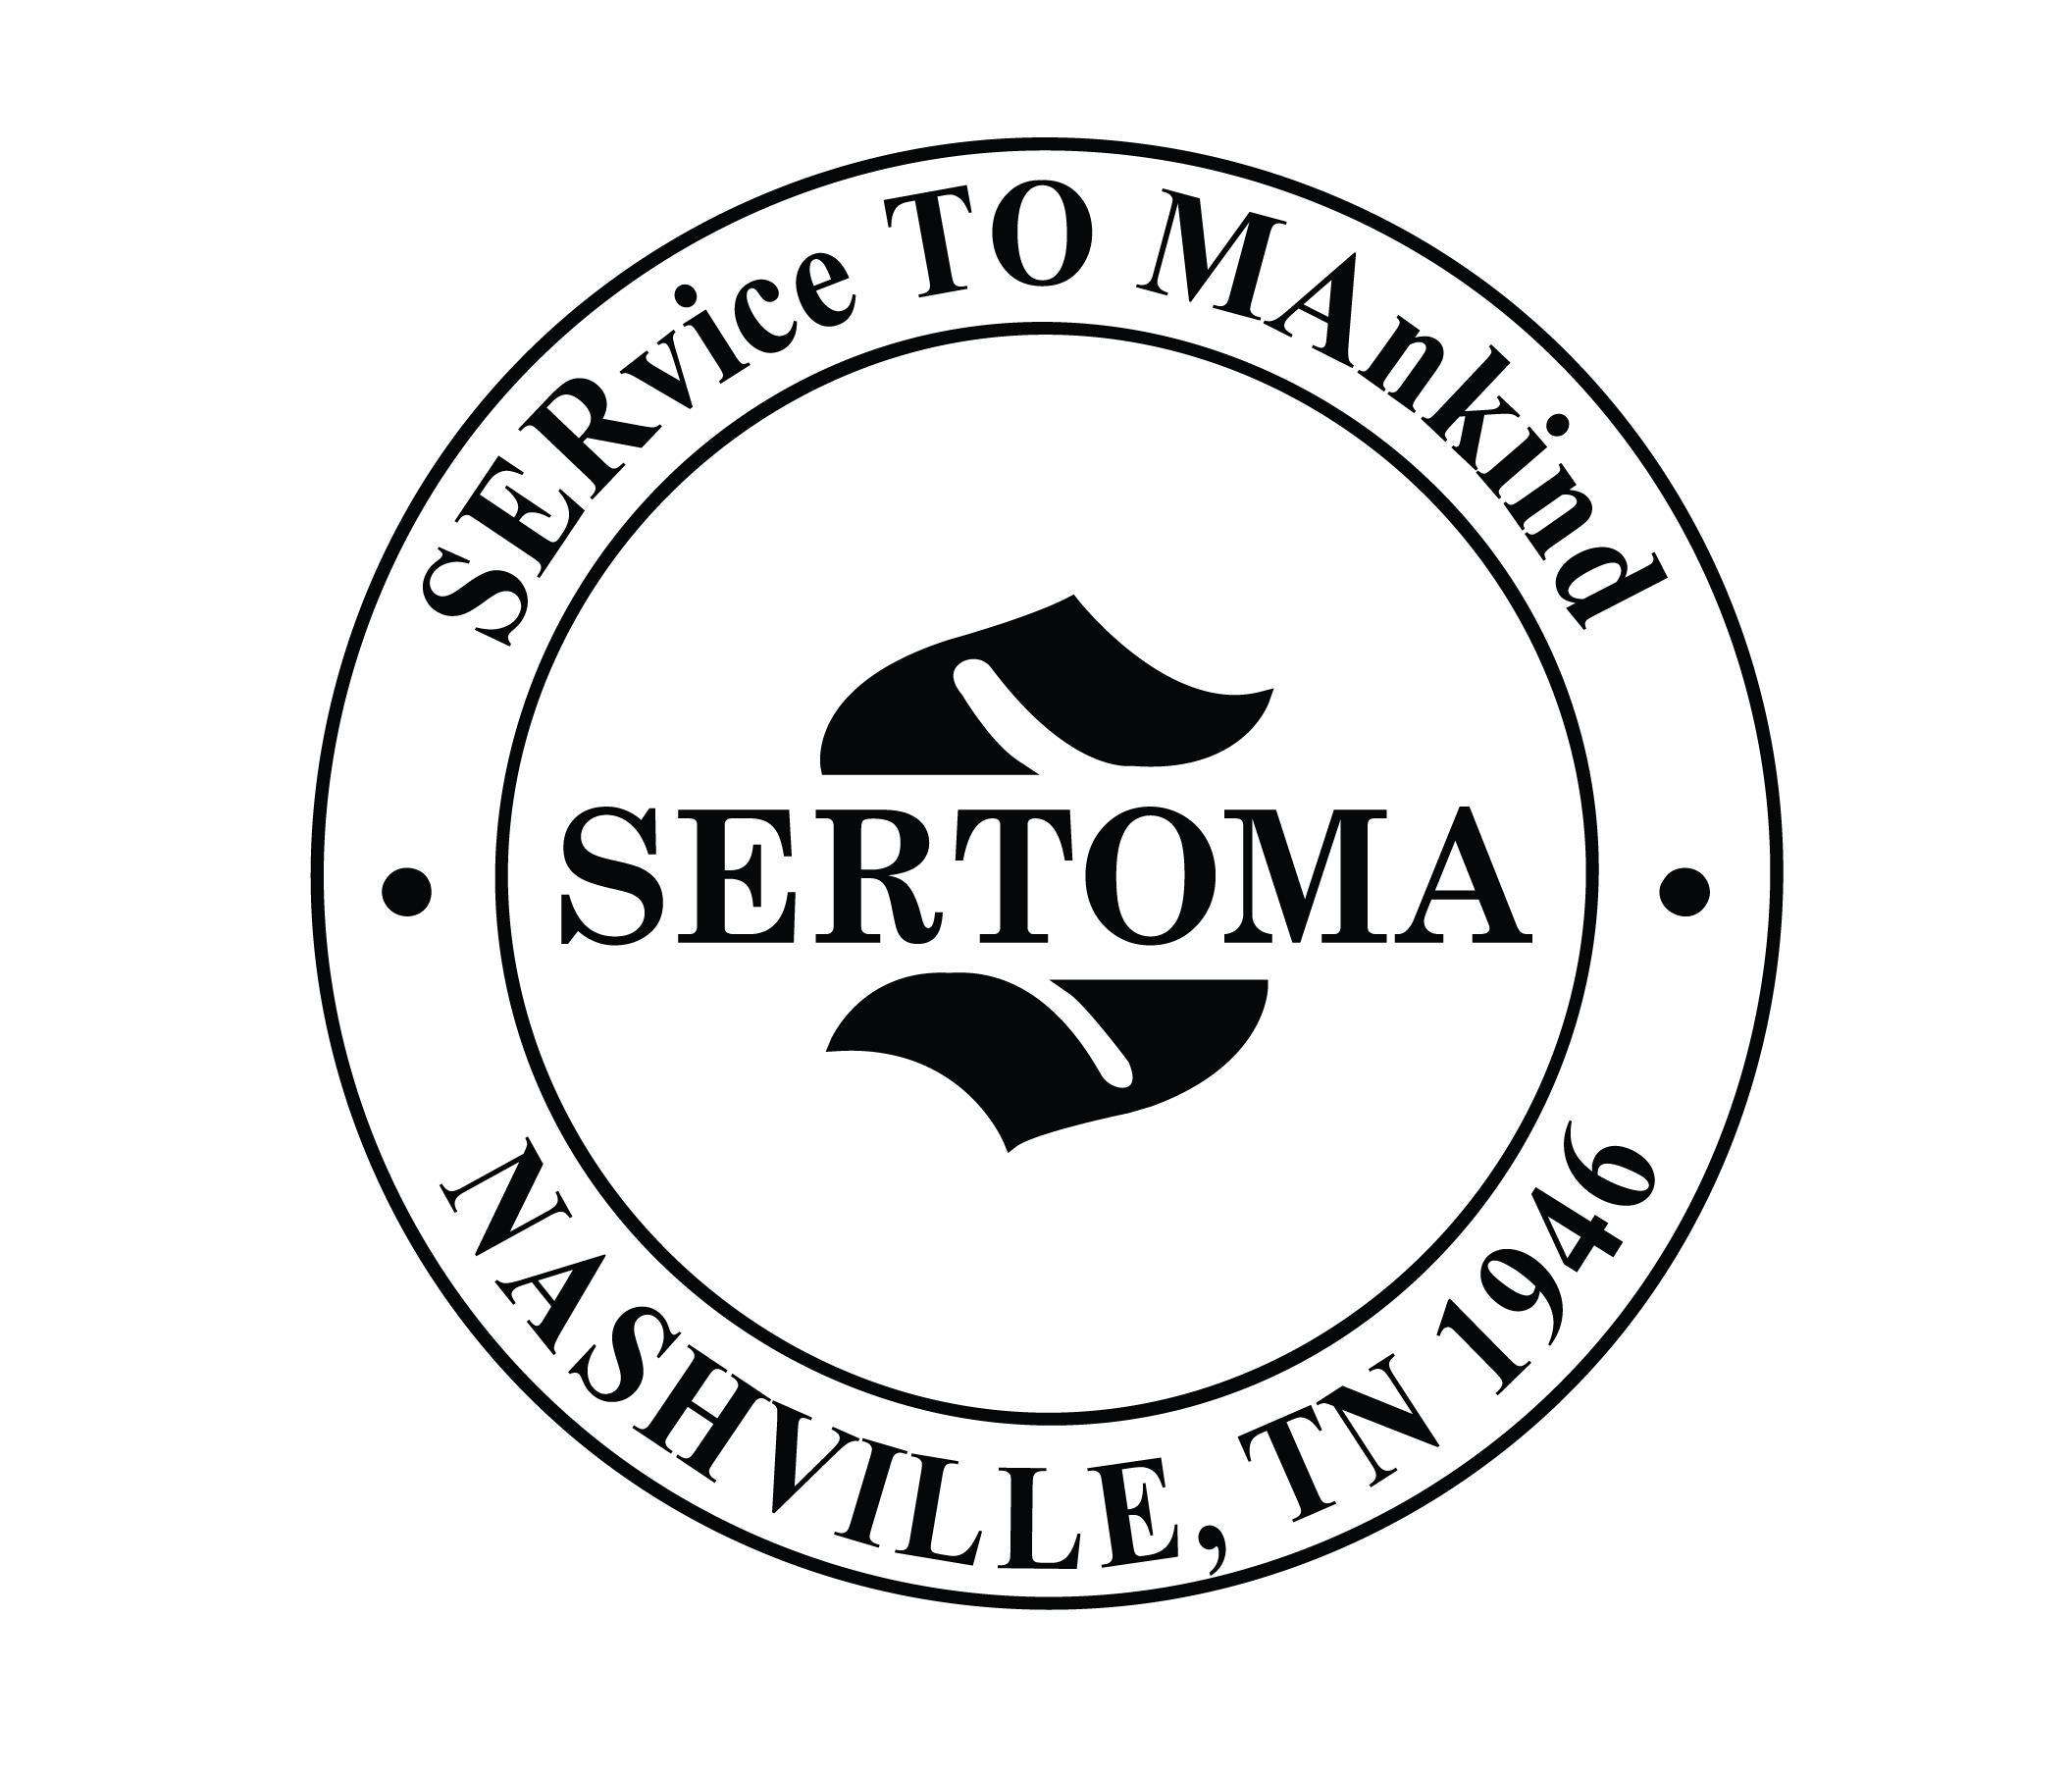 Sertoma